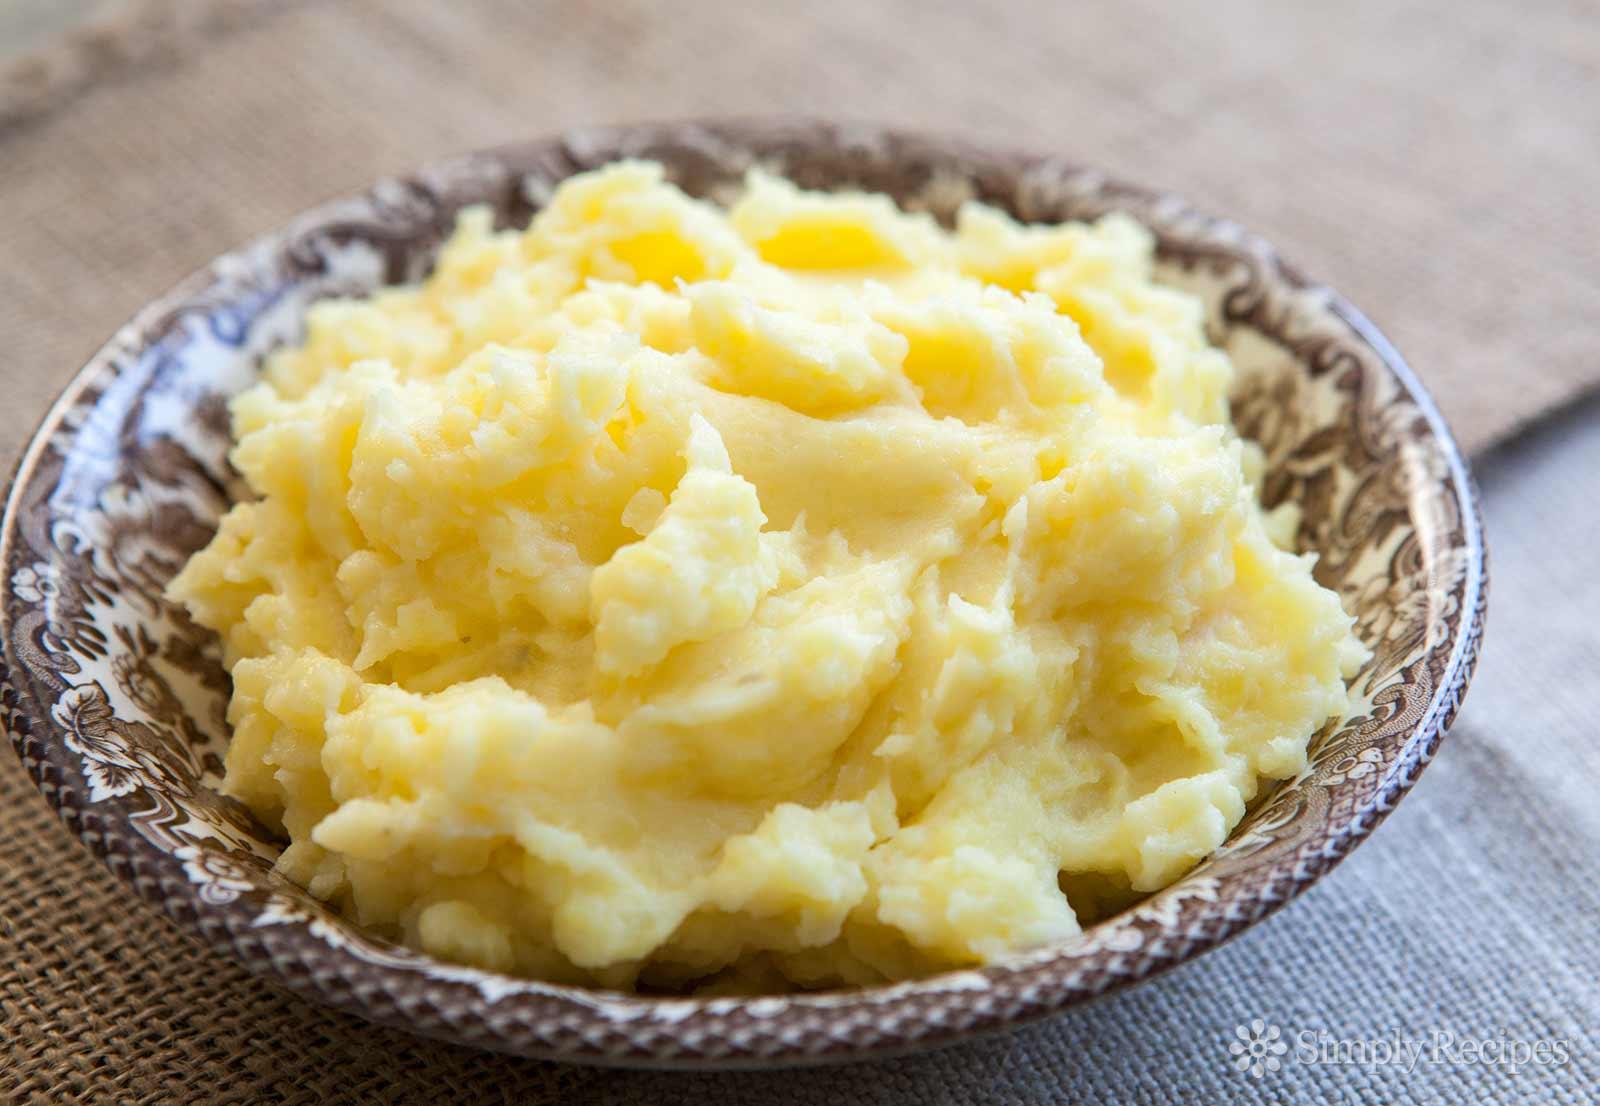 perfect-mashed-potatoes-horiz-a-1600.jpg